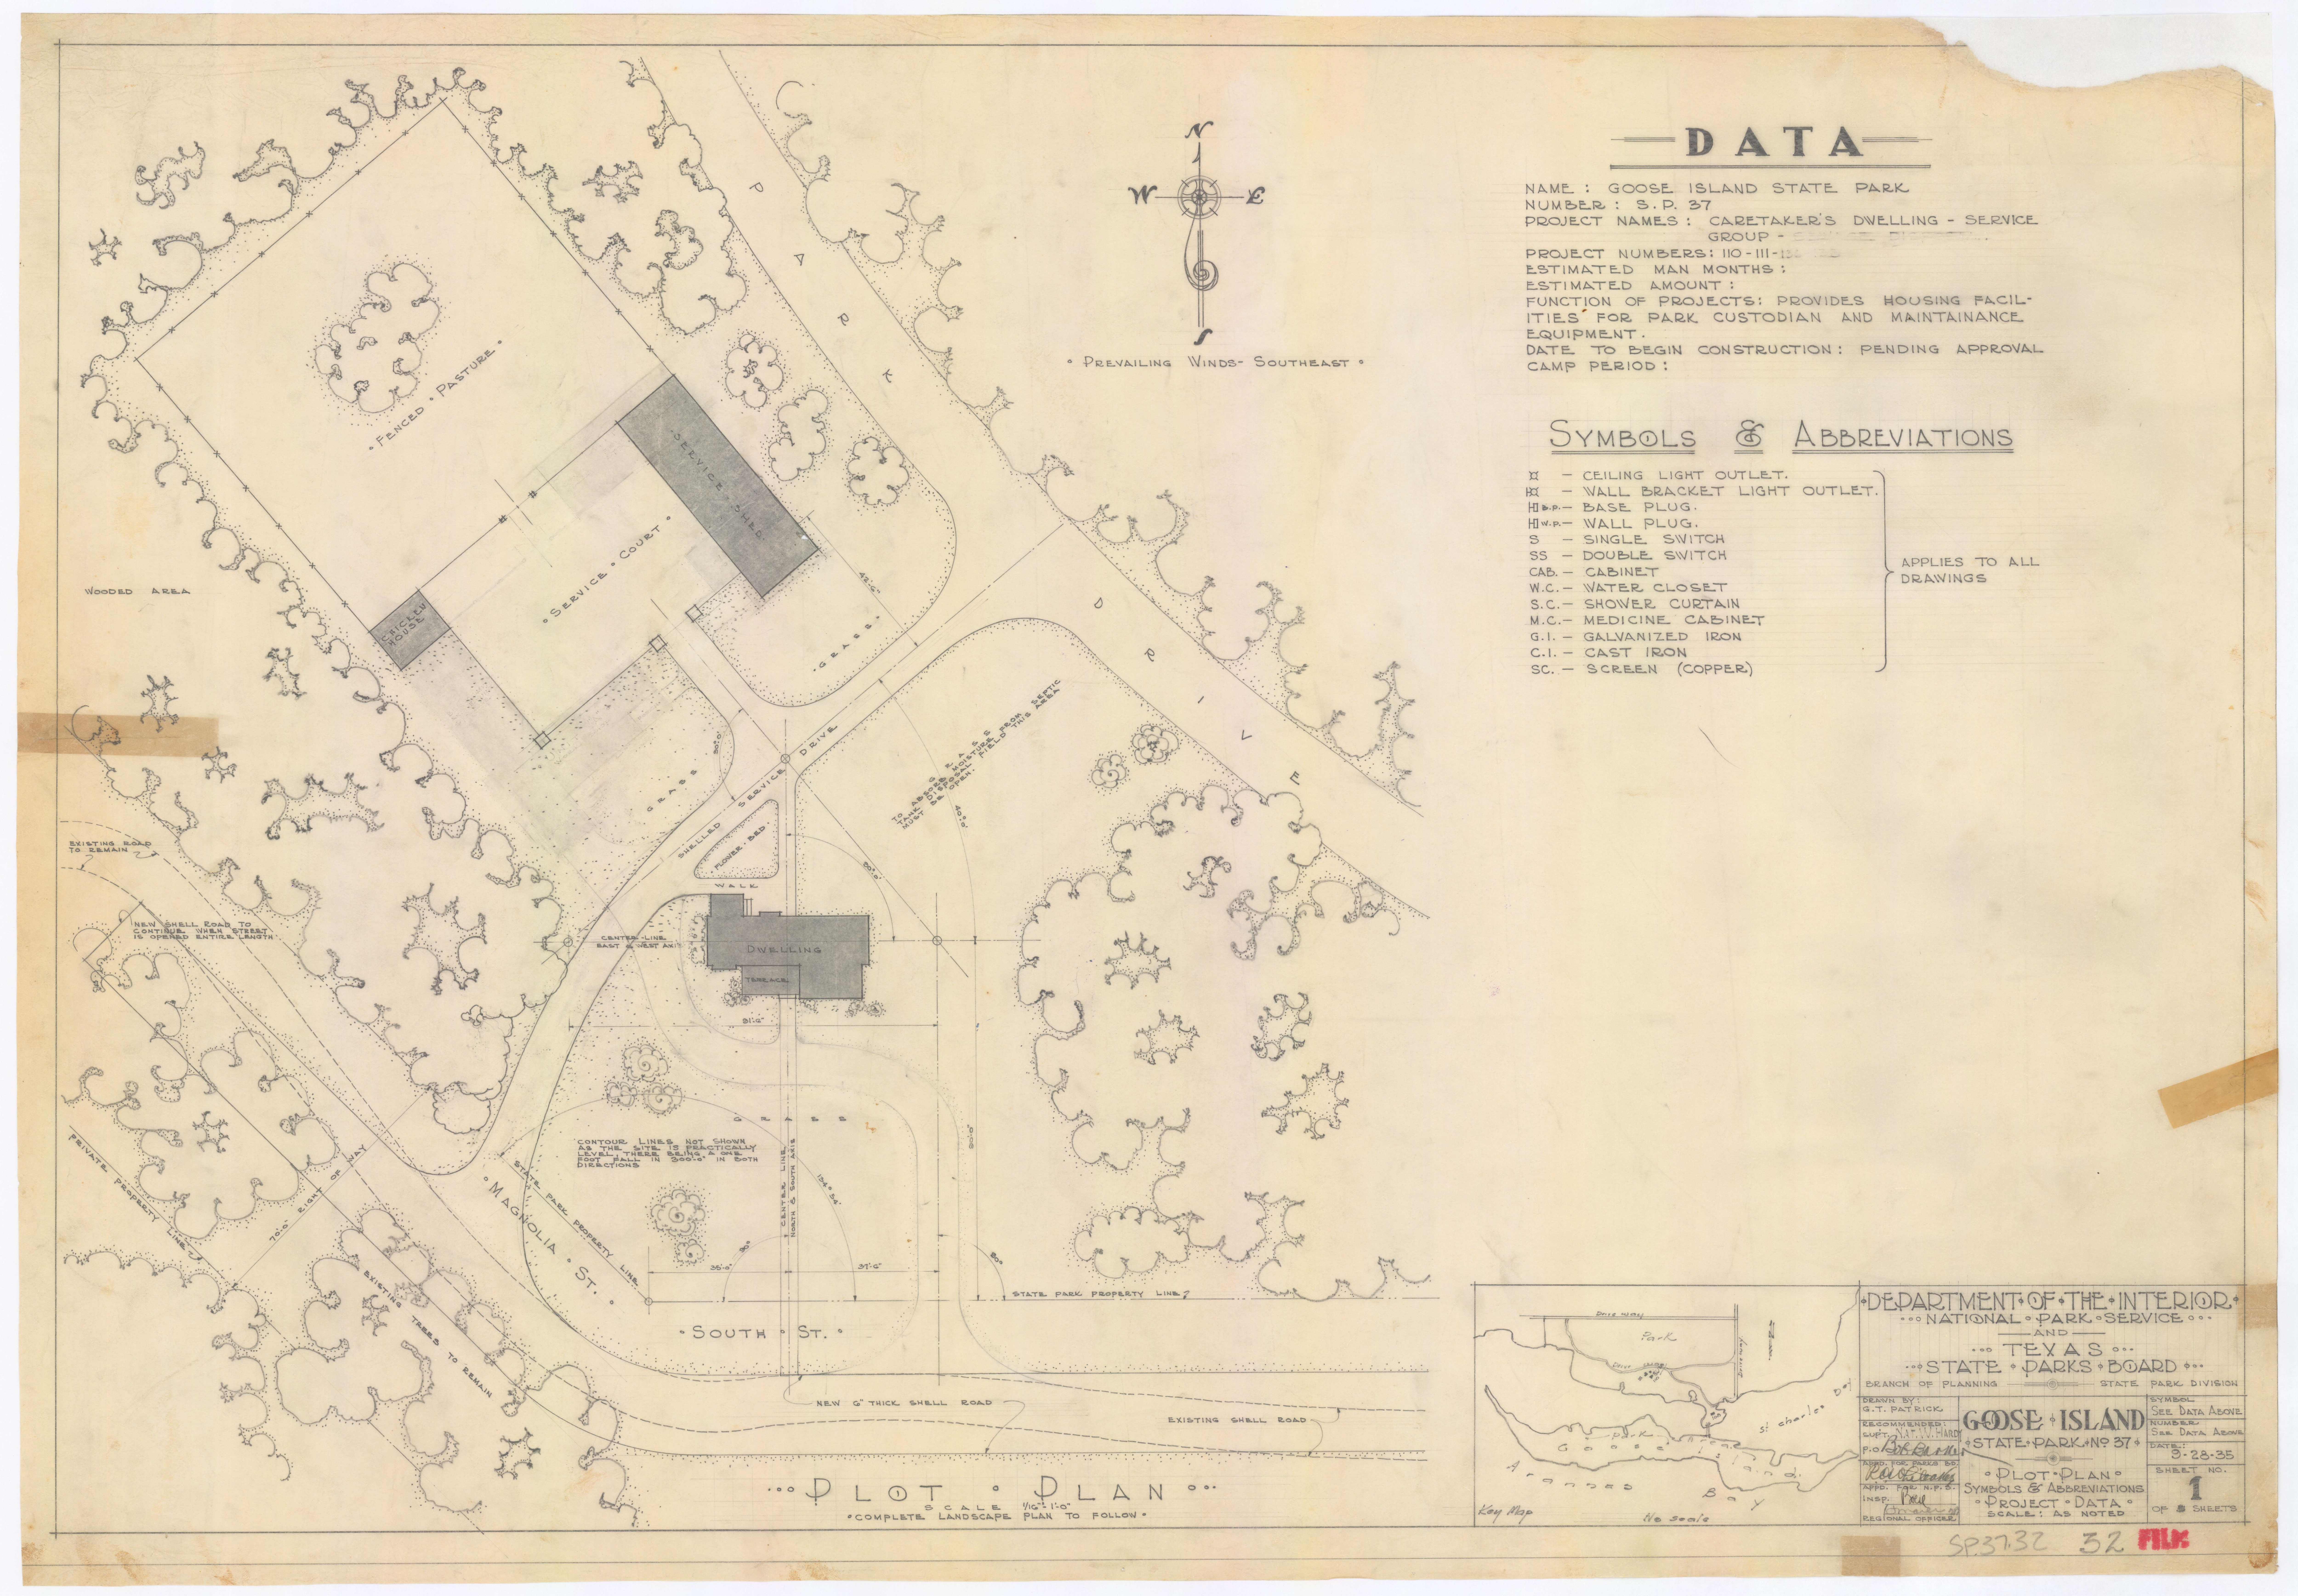 Goose Island State Park - Plot  Plan - SP.37.32